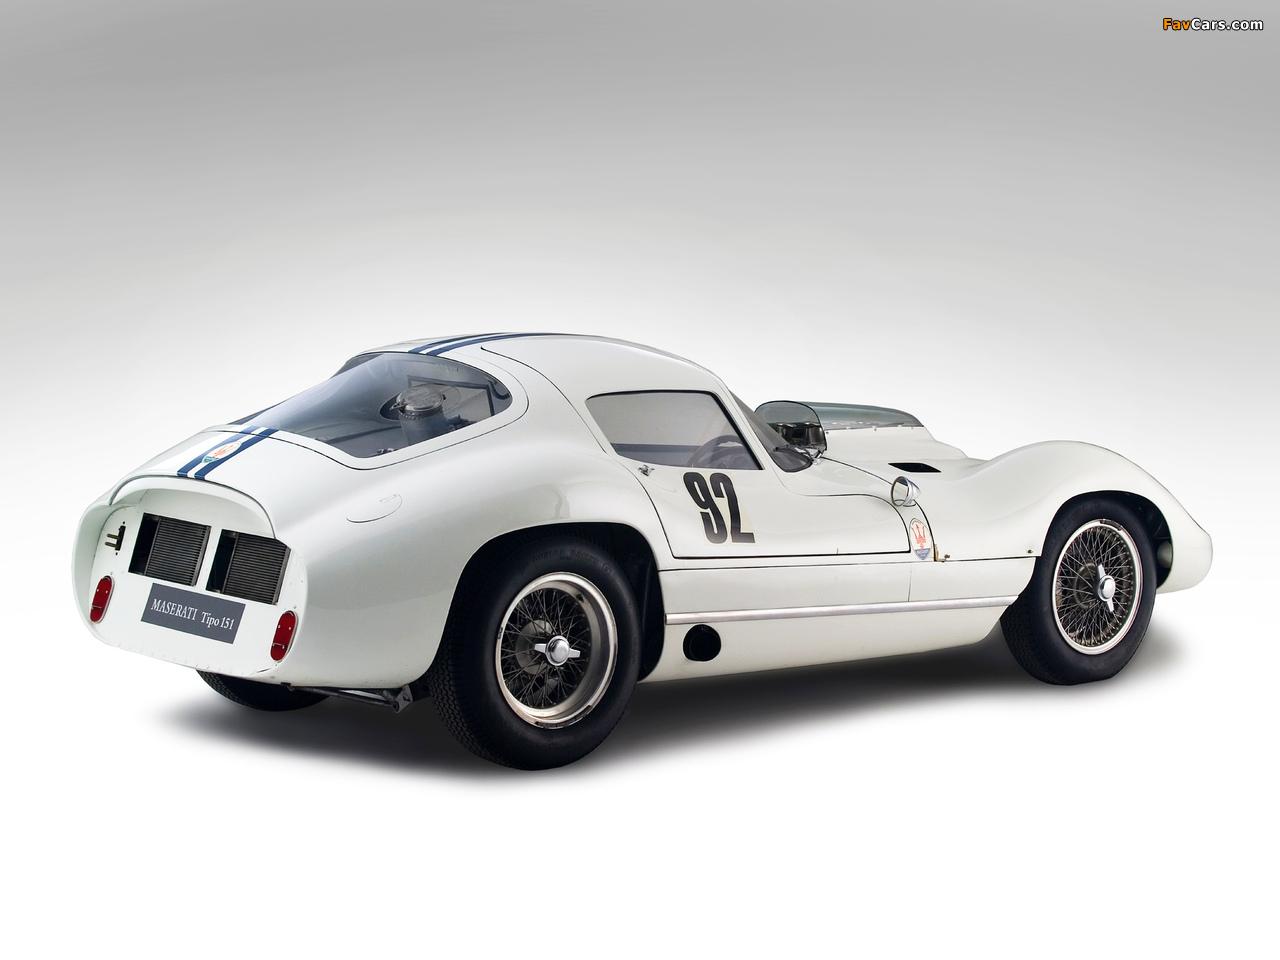 Maserati Tipo 151 1962 images (1280 x 960)